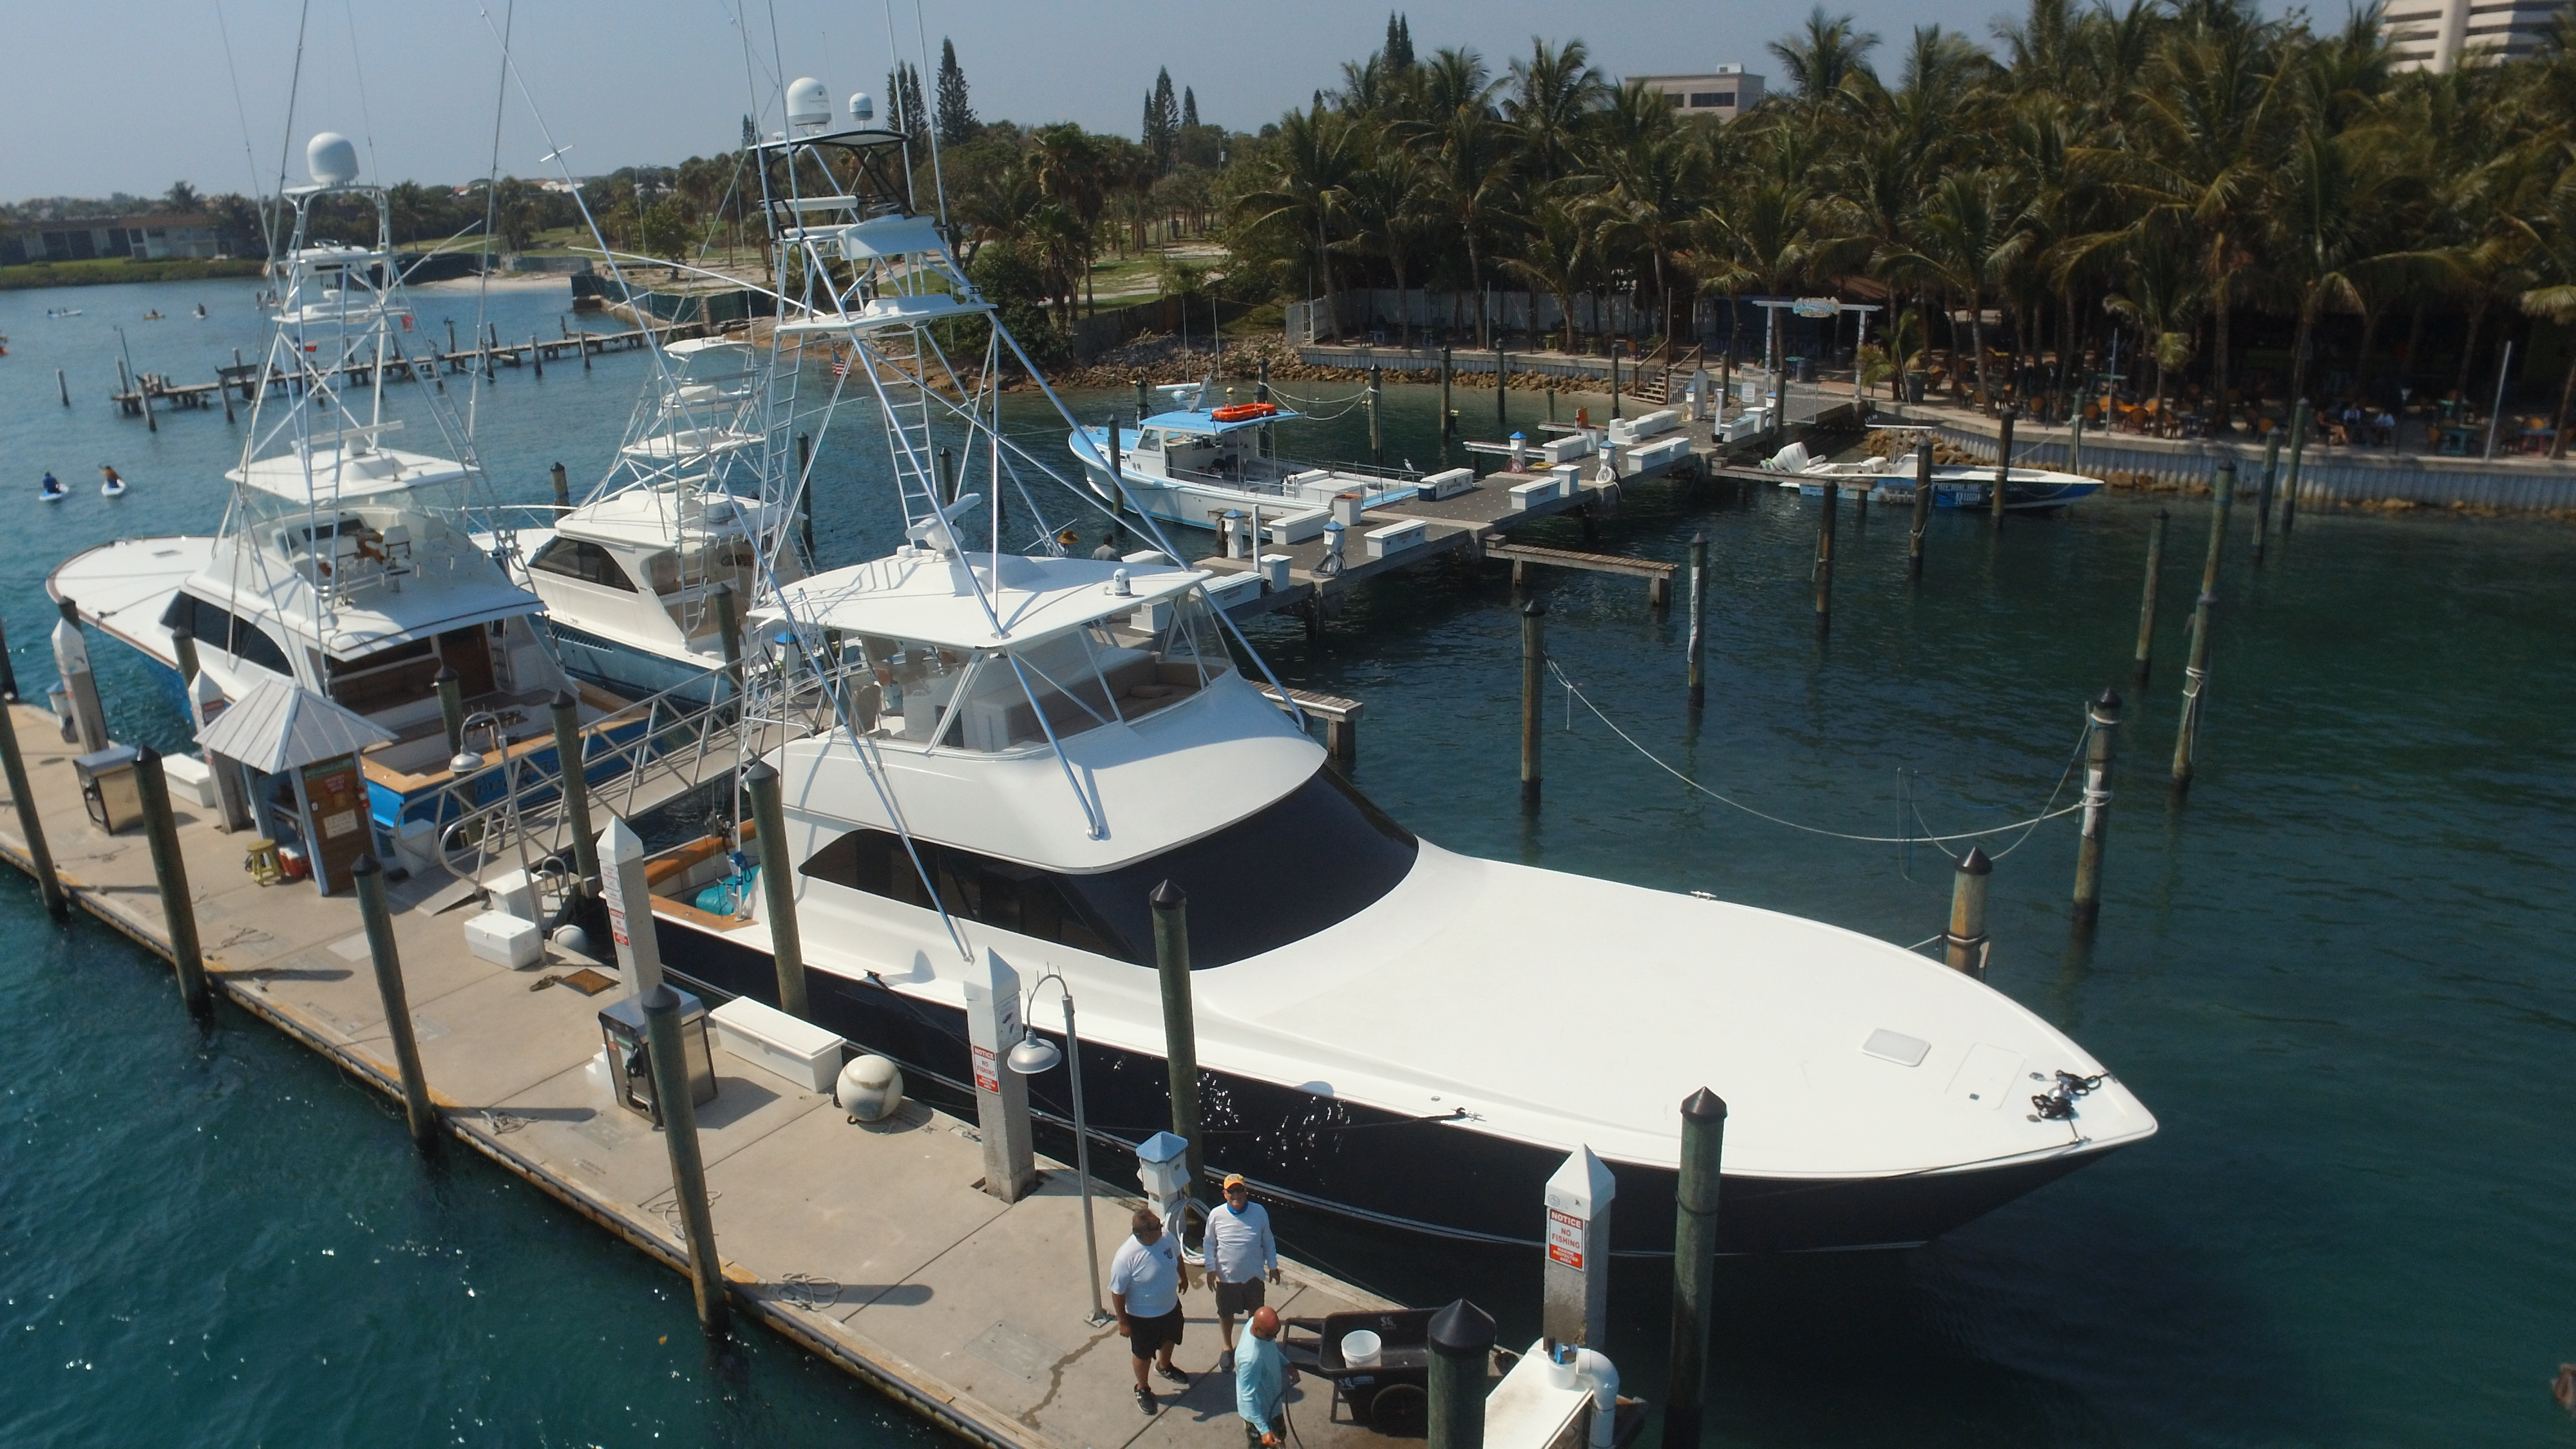 Boat Wraps Boat Graphics Crd Wraps West Palm Beach Fl